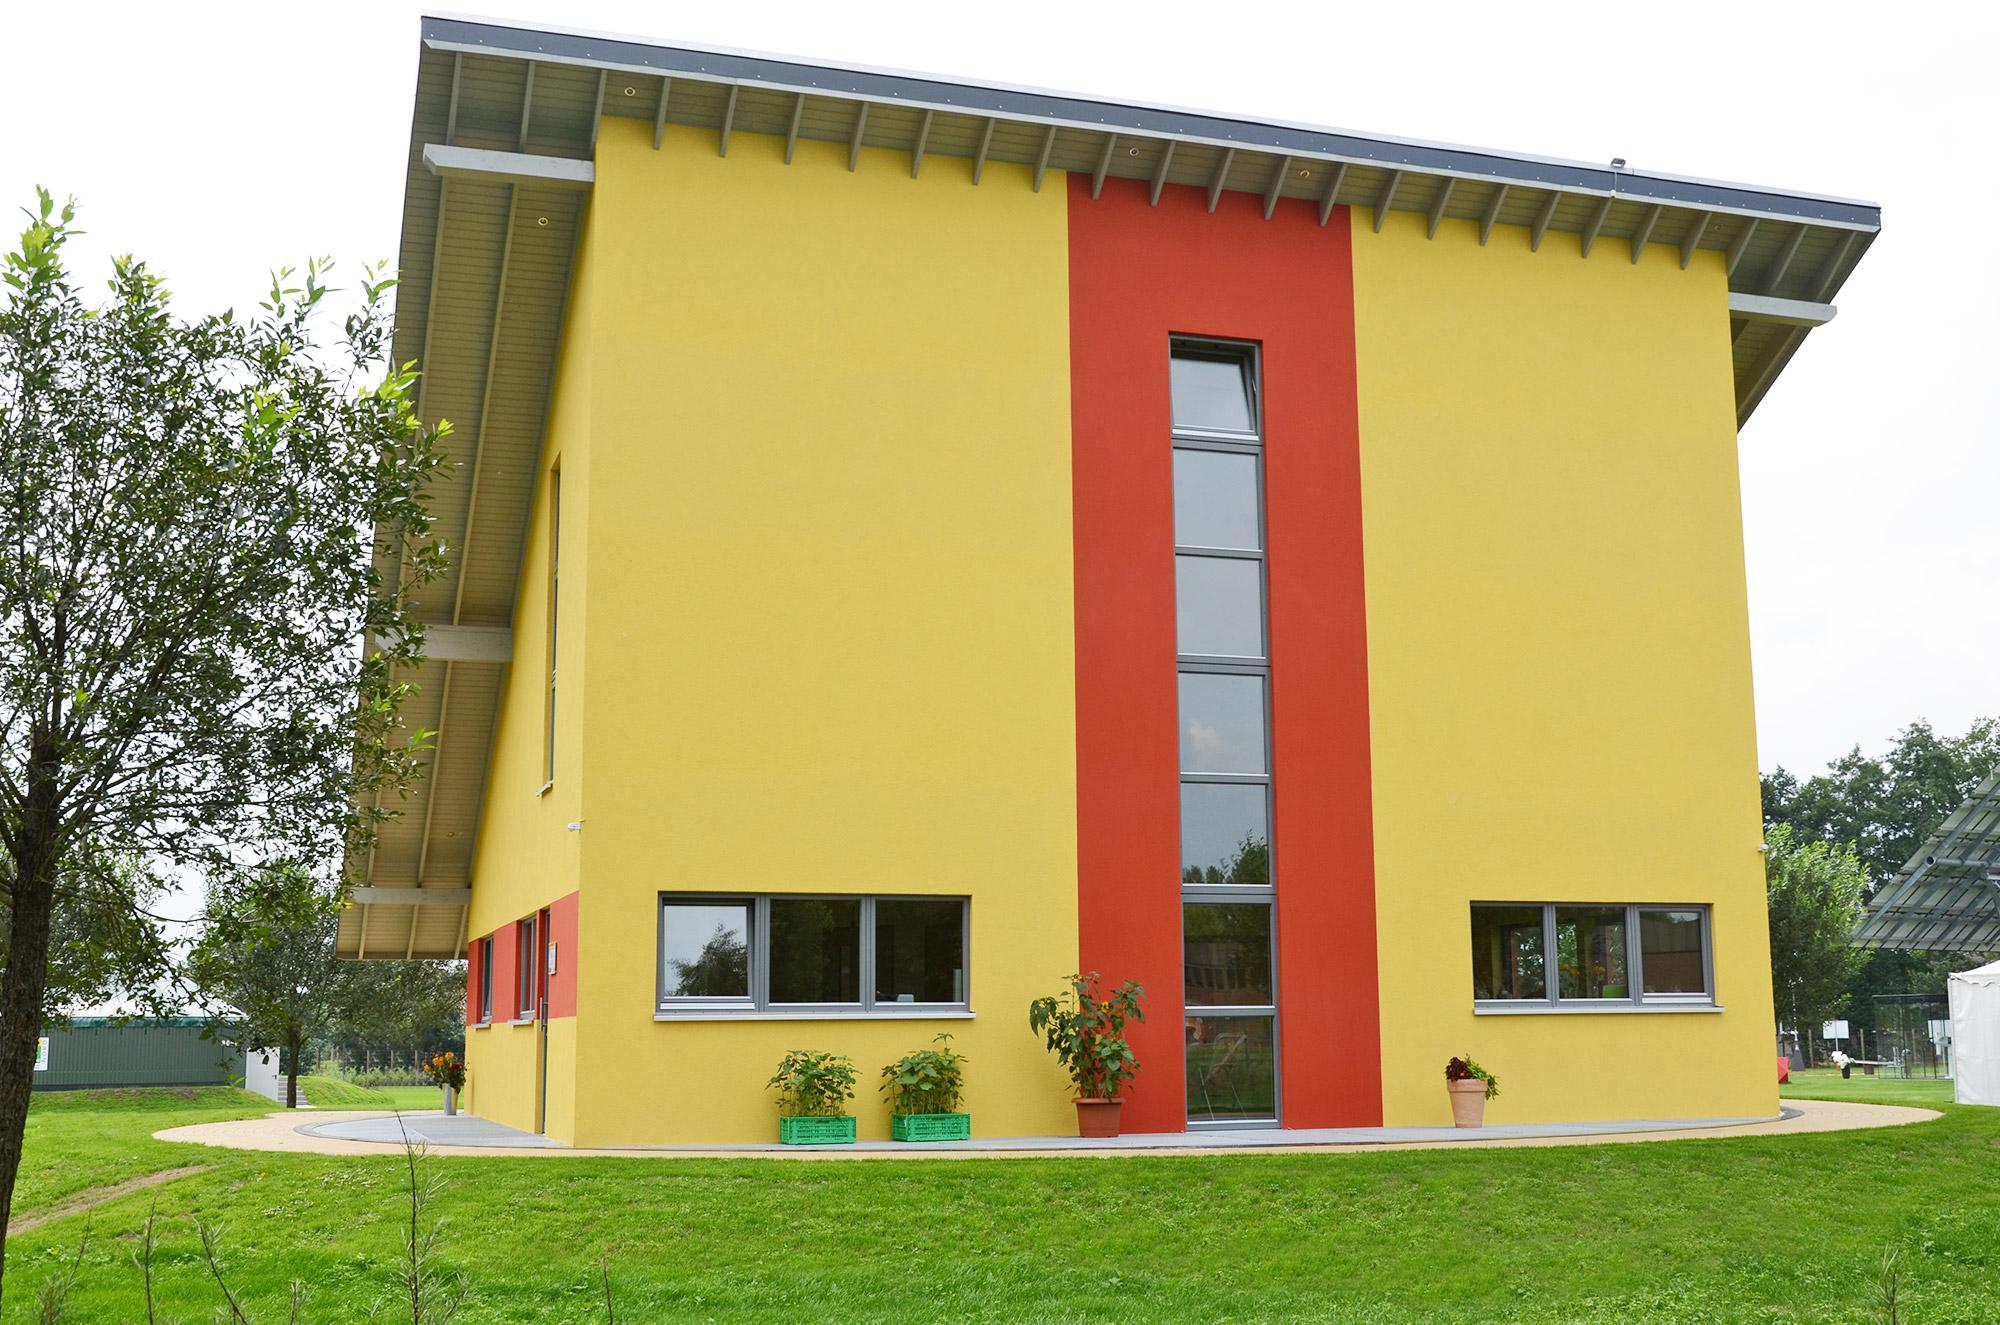 Haus Niedersachsen